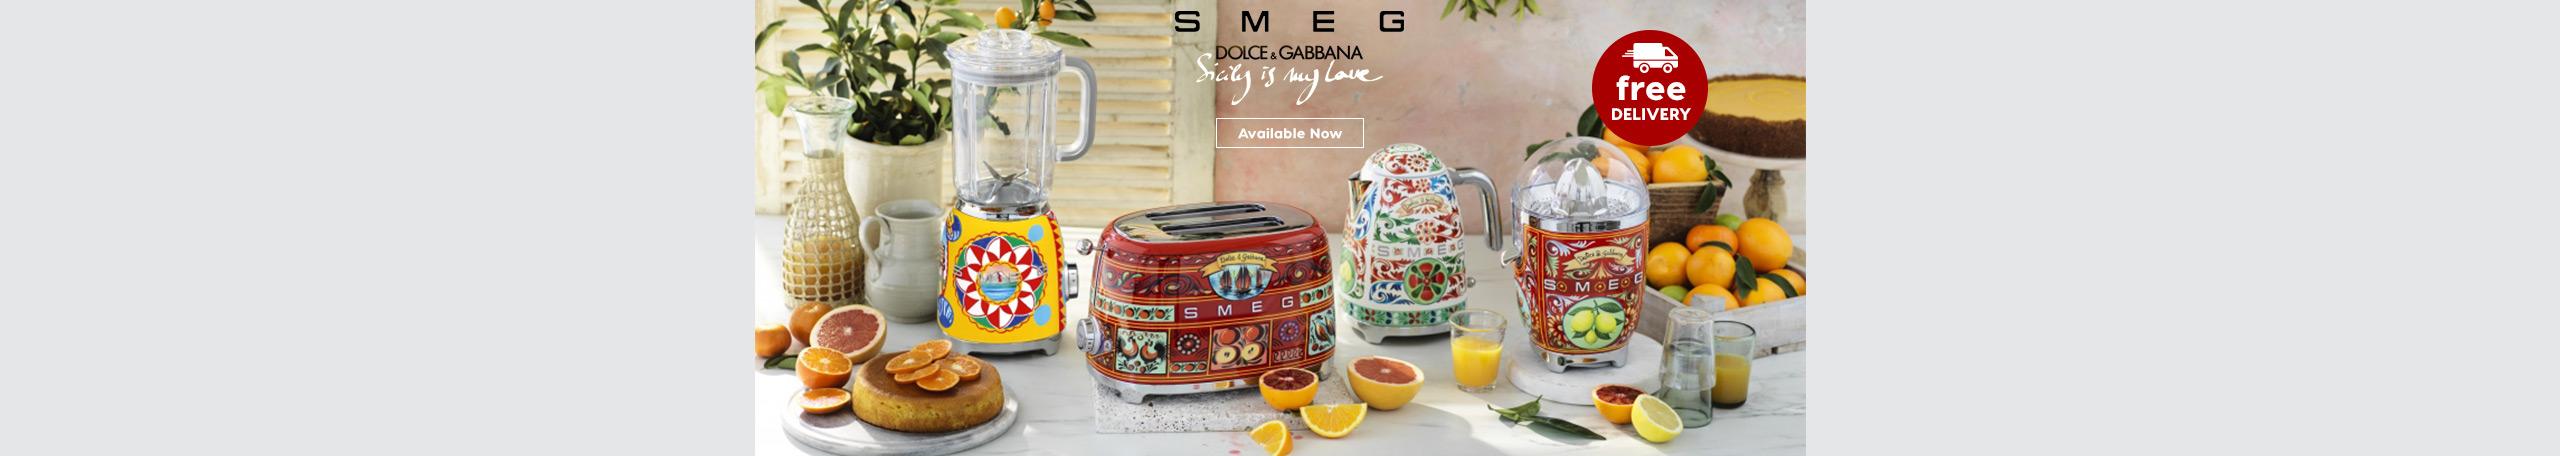 Smeg Dolce & Gabbana Appliances